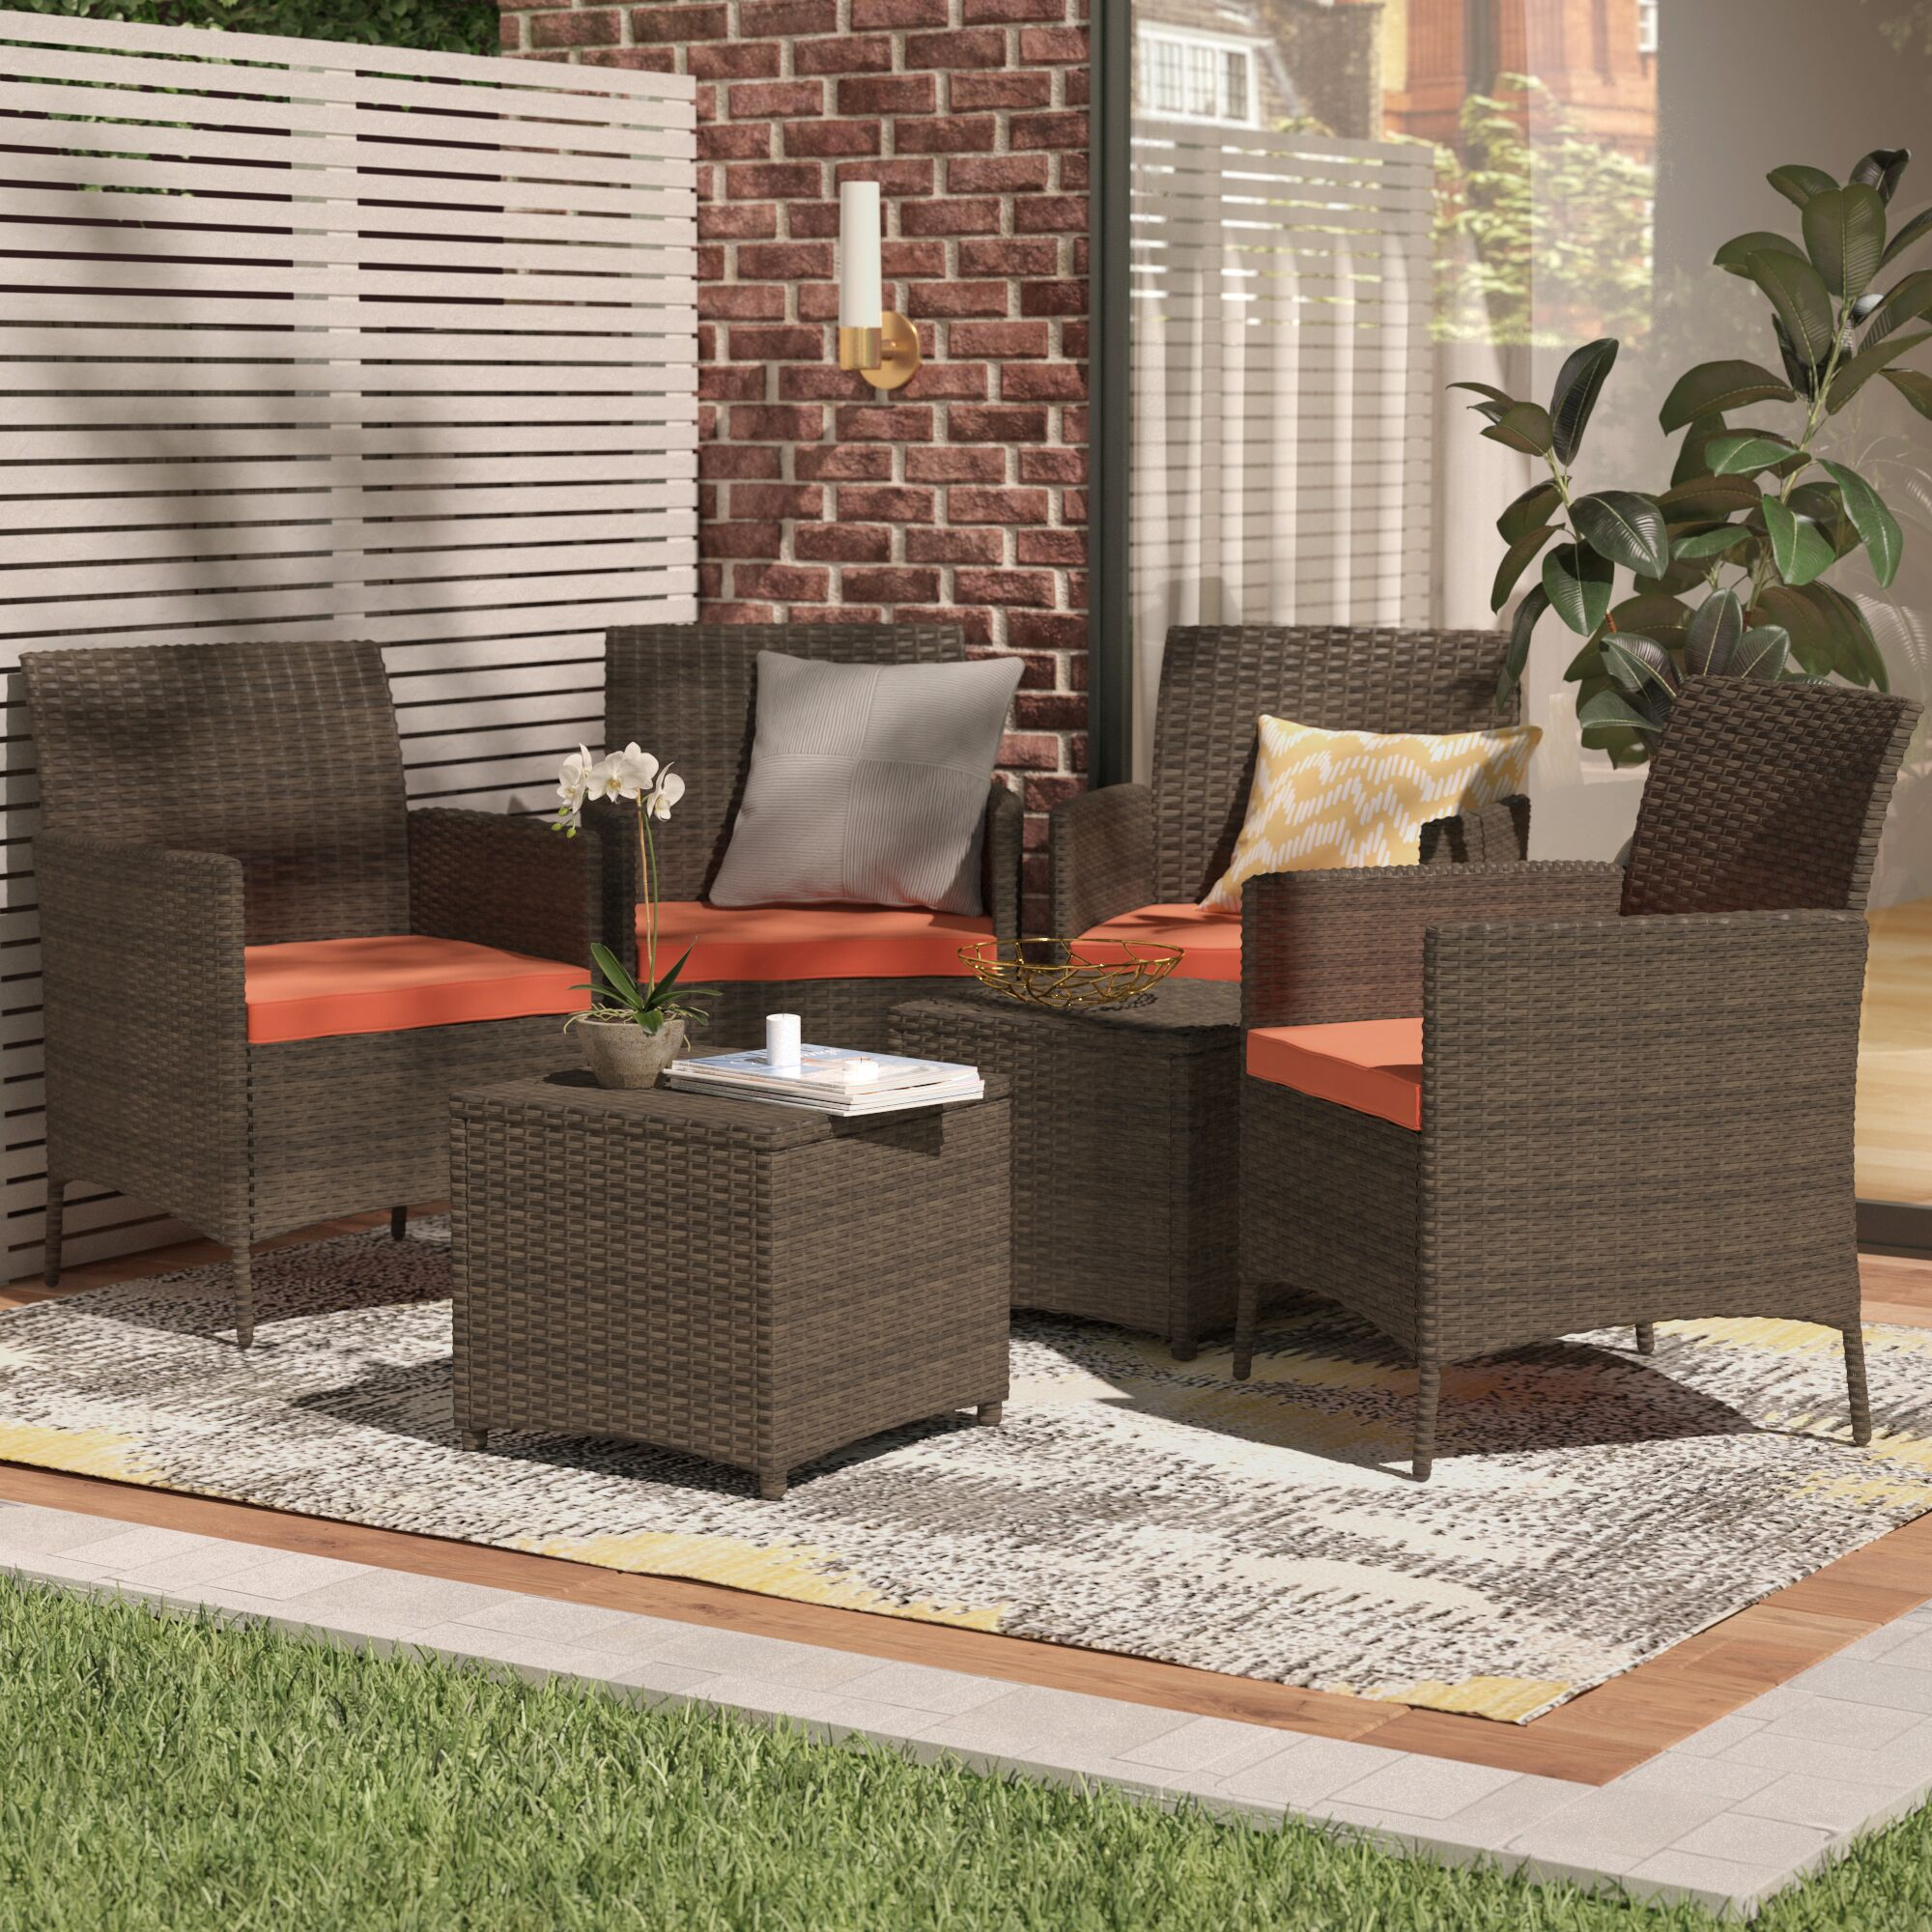 Auclair Wicker Patio 6 Piece Rattan Conversation Set with Cushions